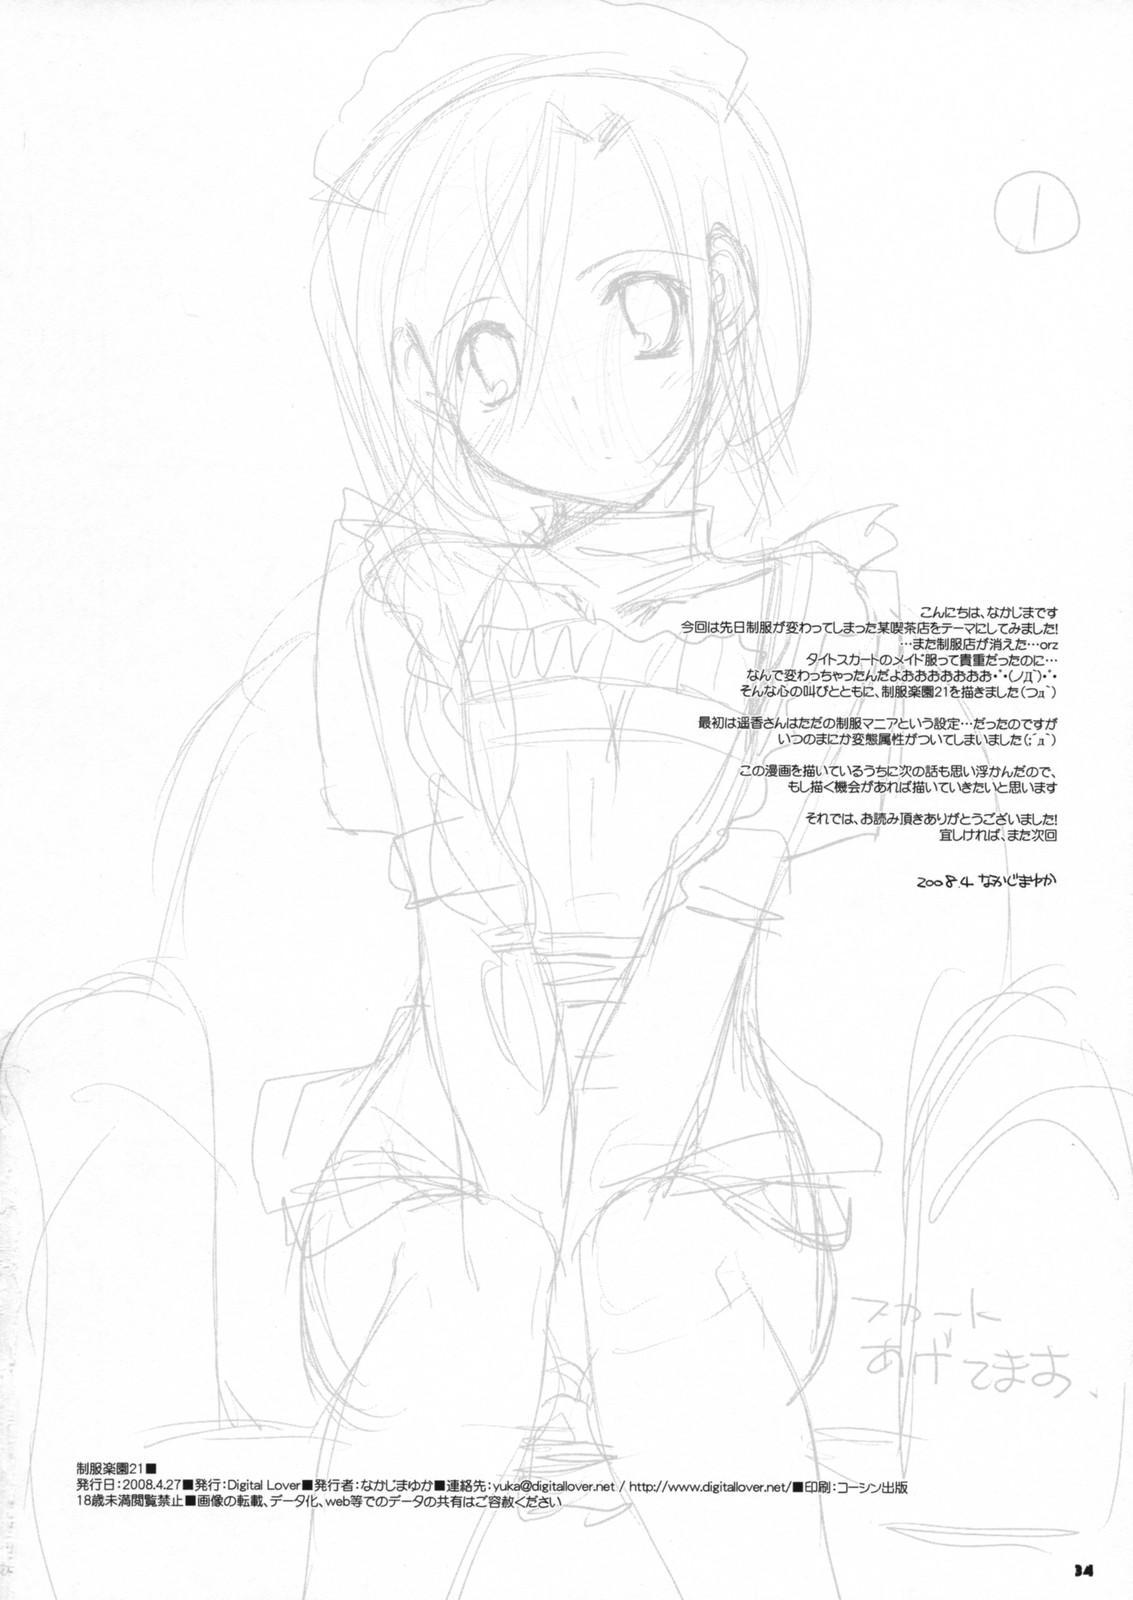 Seifuku Rakuen 21 - Costume Paradise 21 32